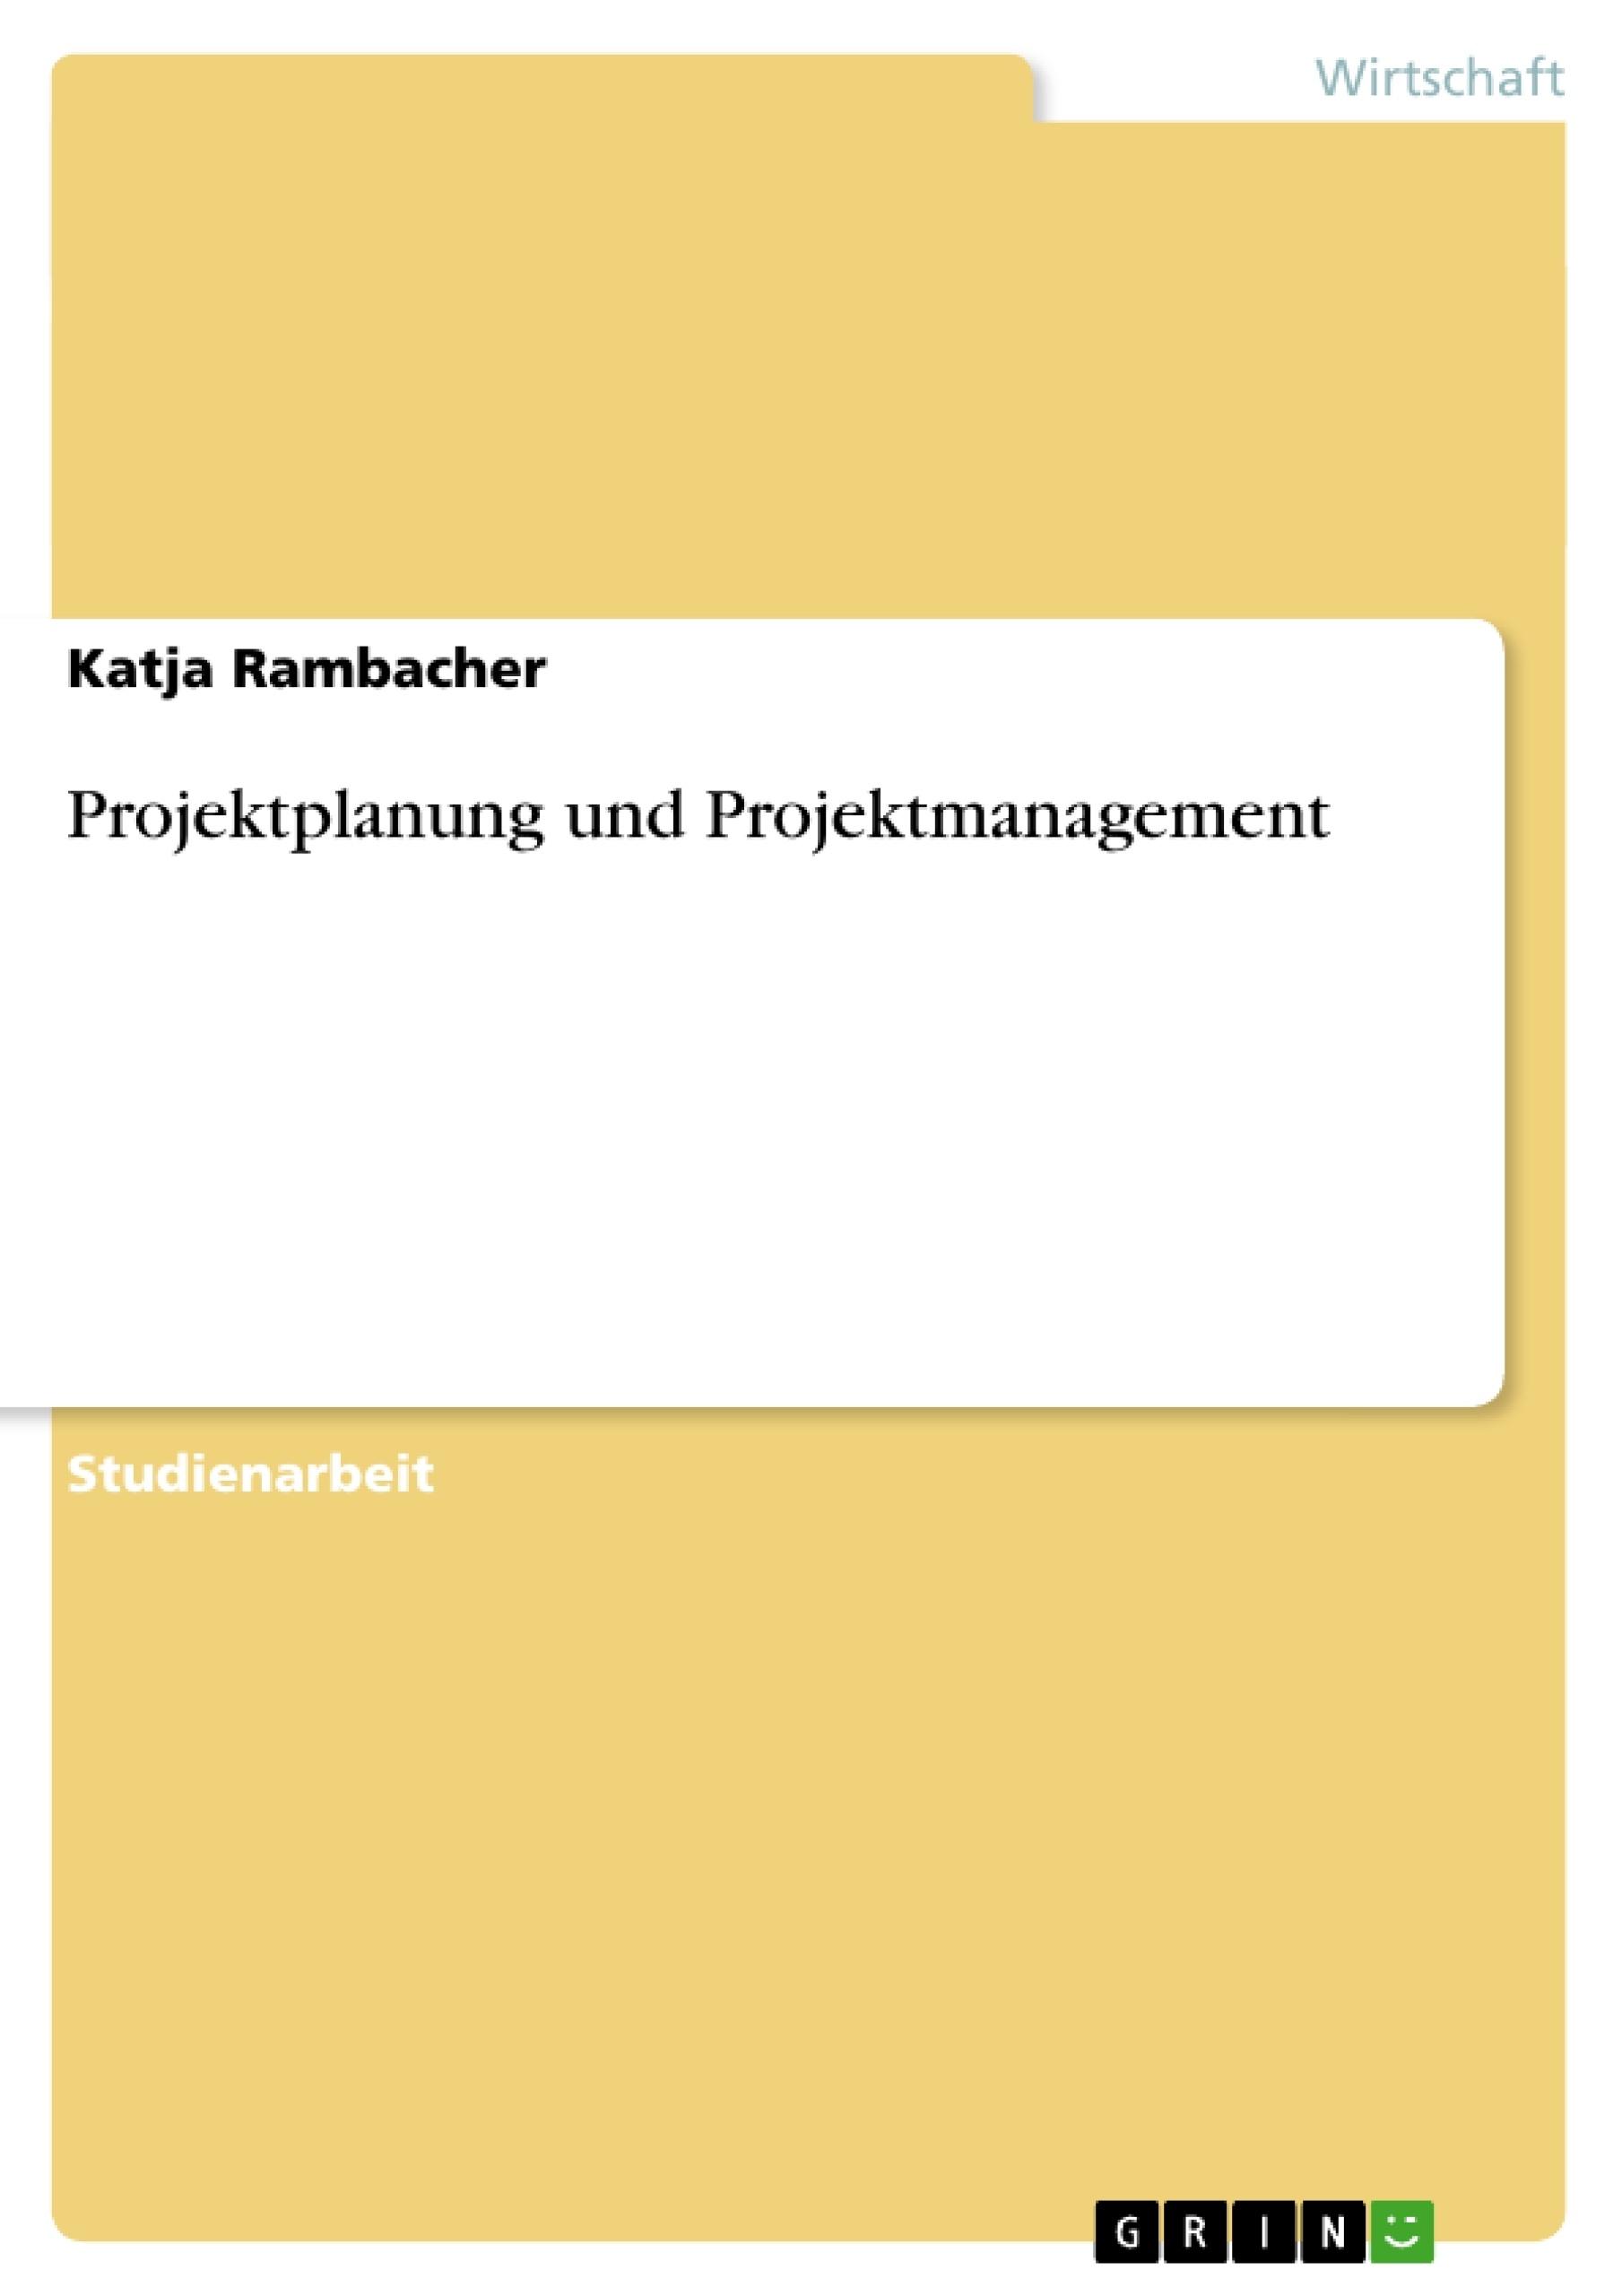 Titel: Projektplanung und Projektmanagement